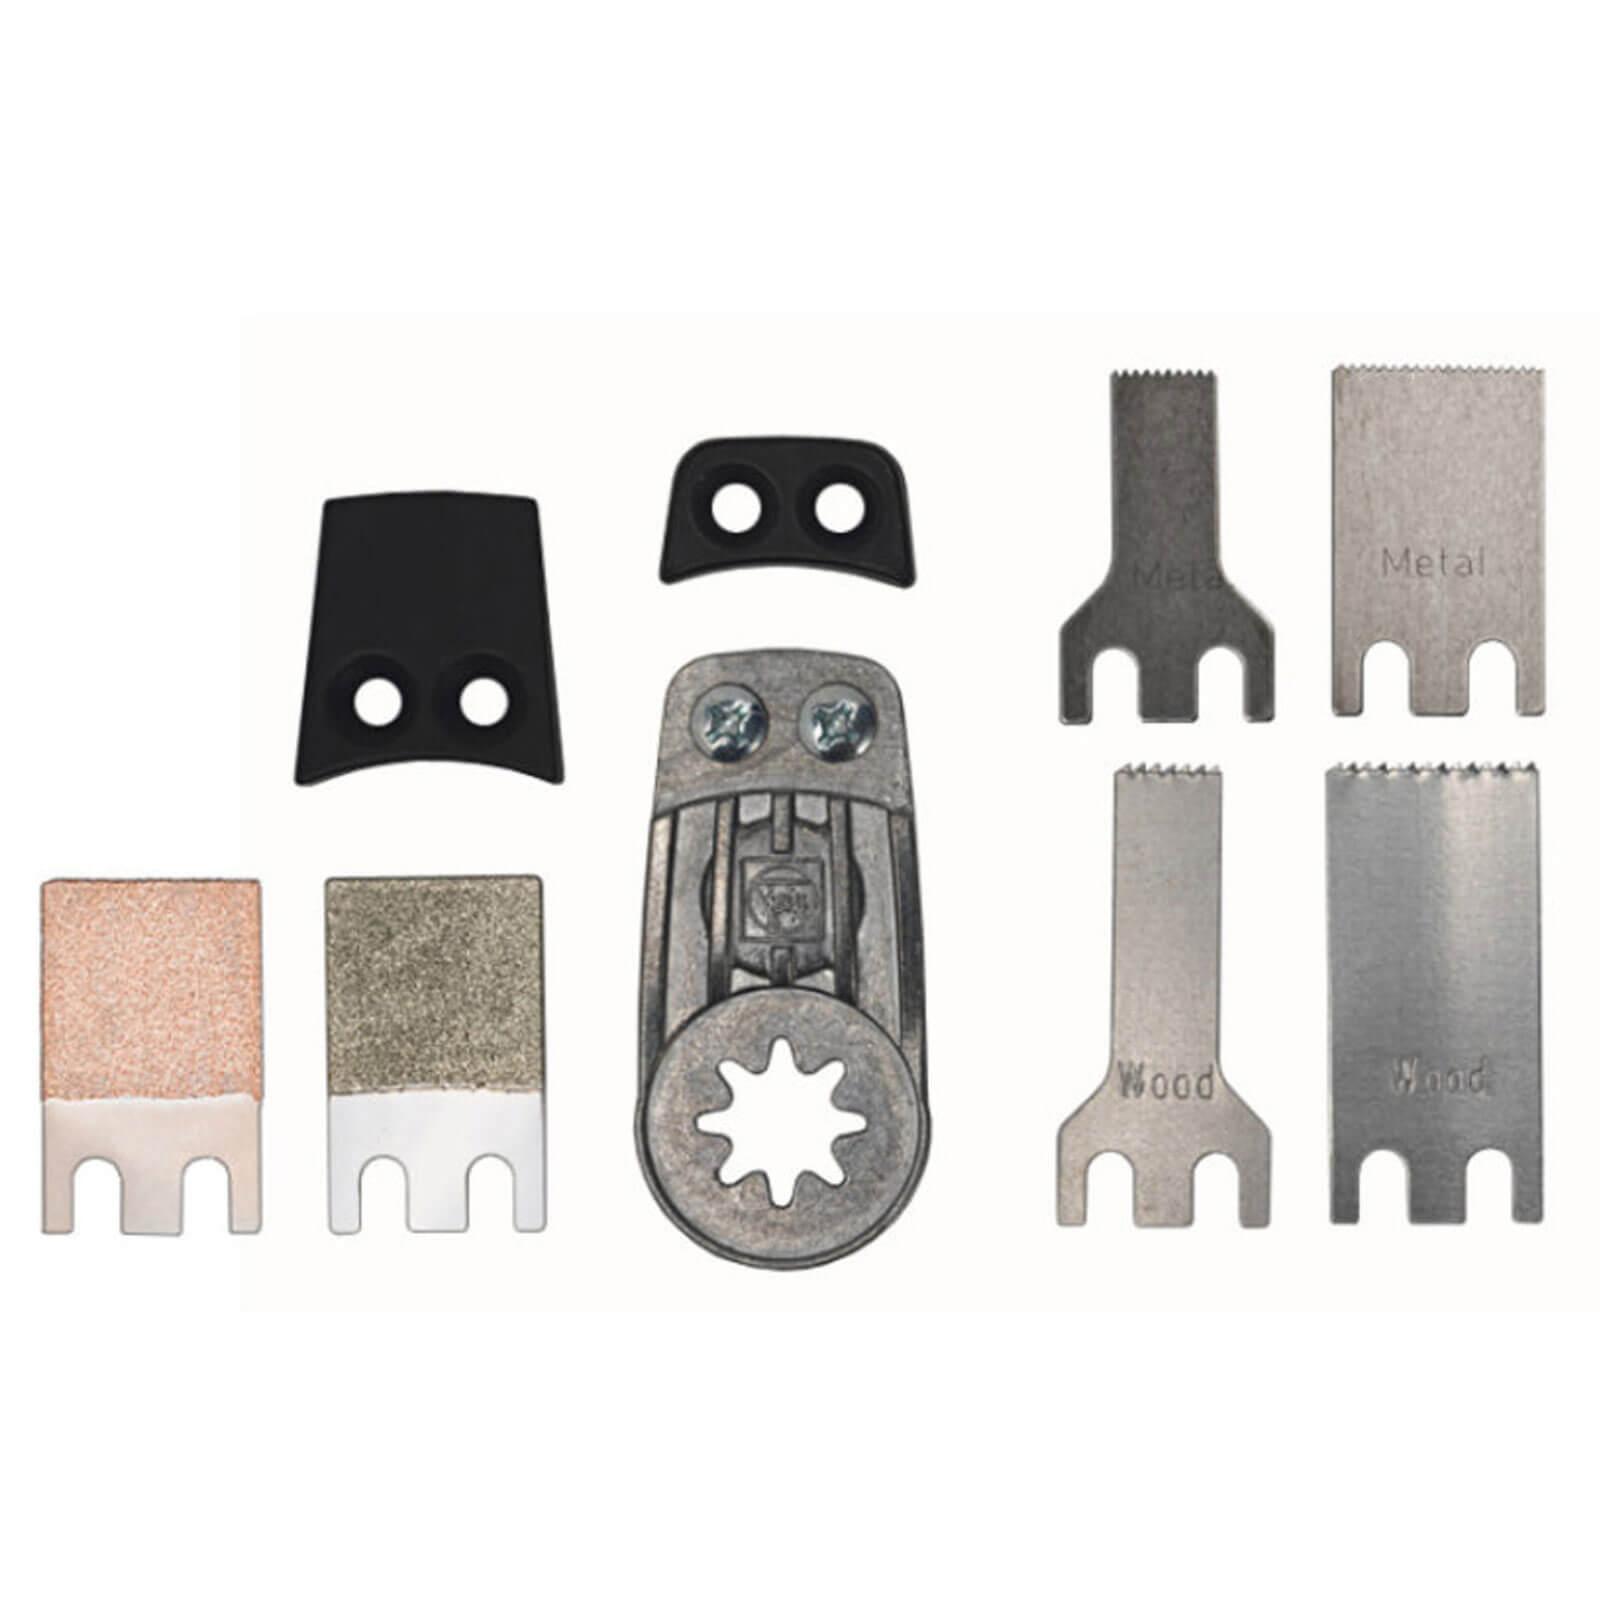 Image of Fein 9 Piece Mini Multi Tool Blade & File Set